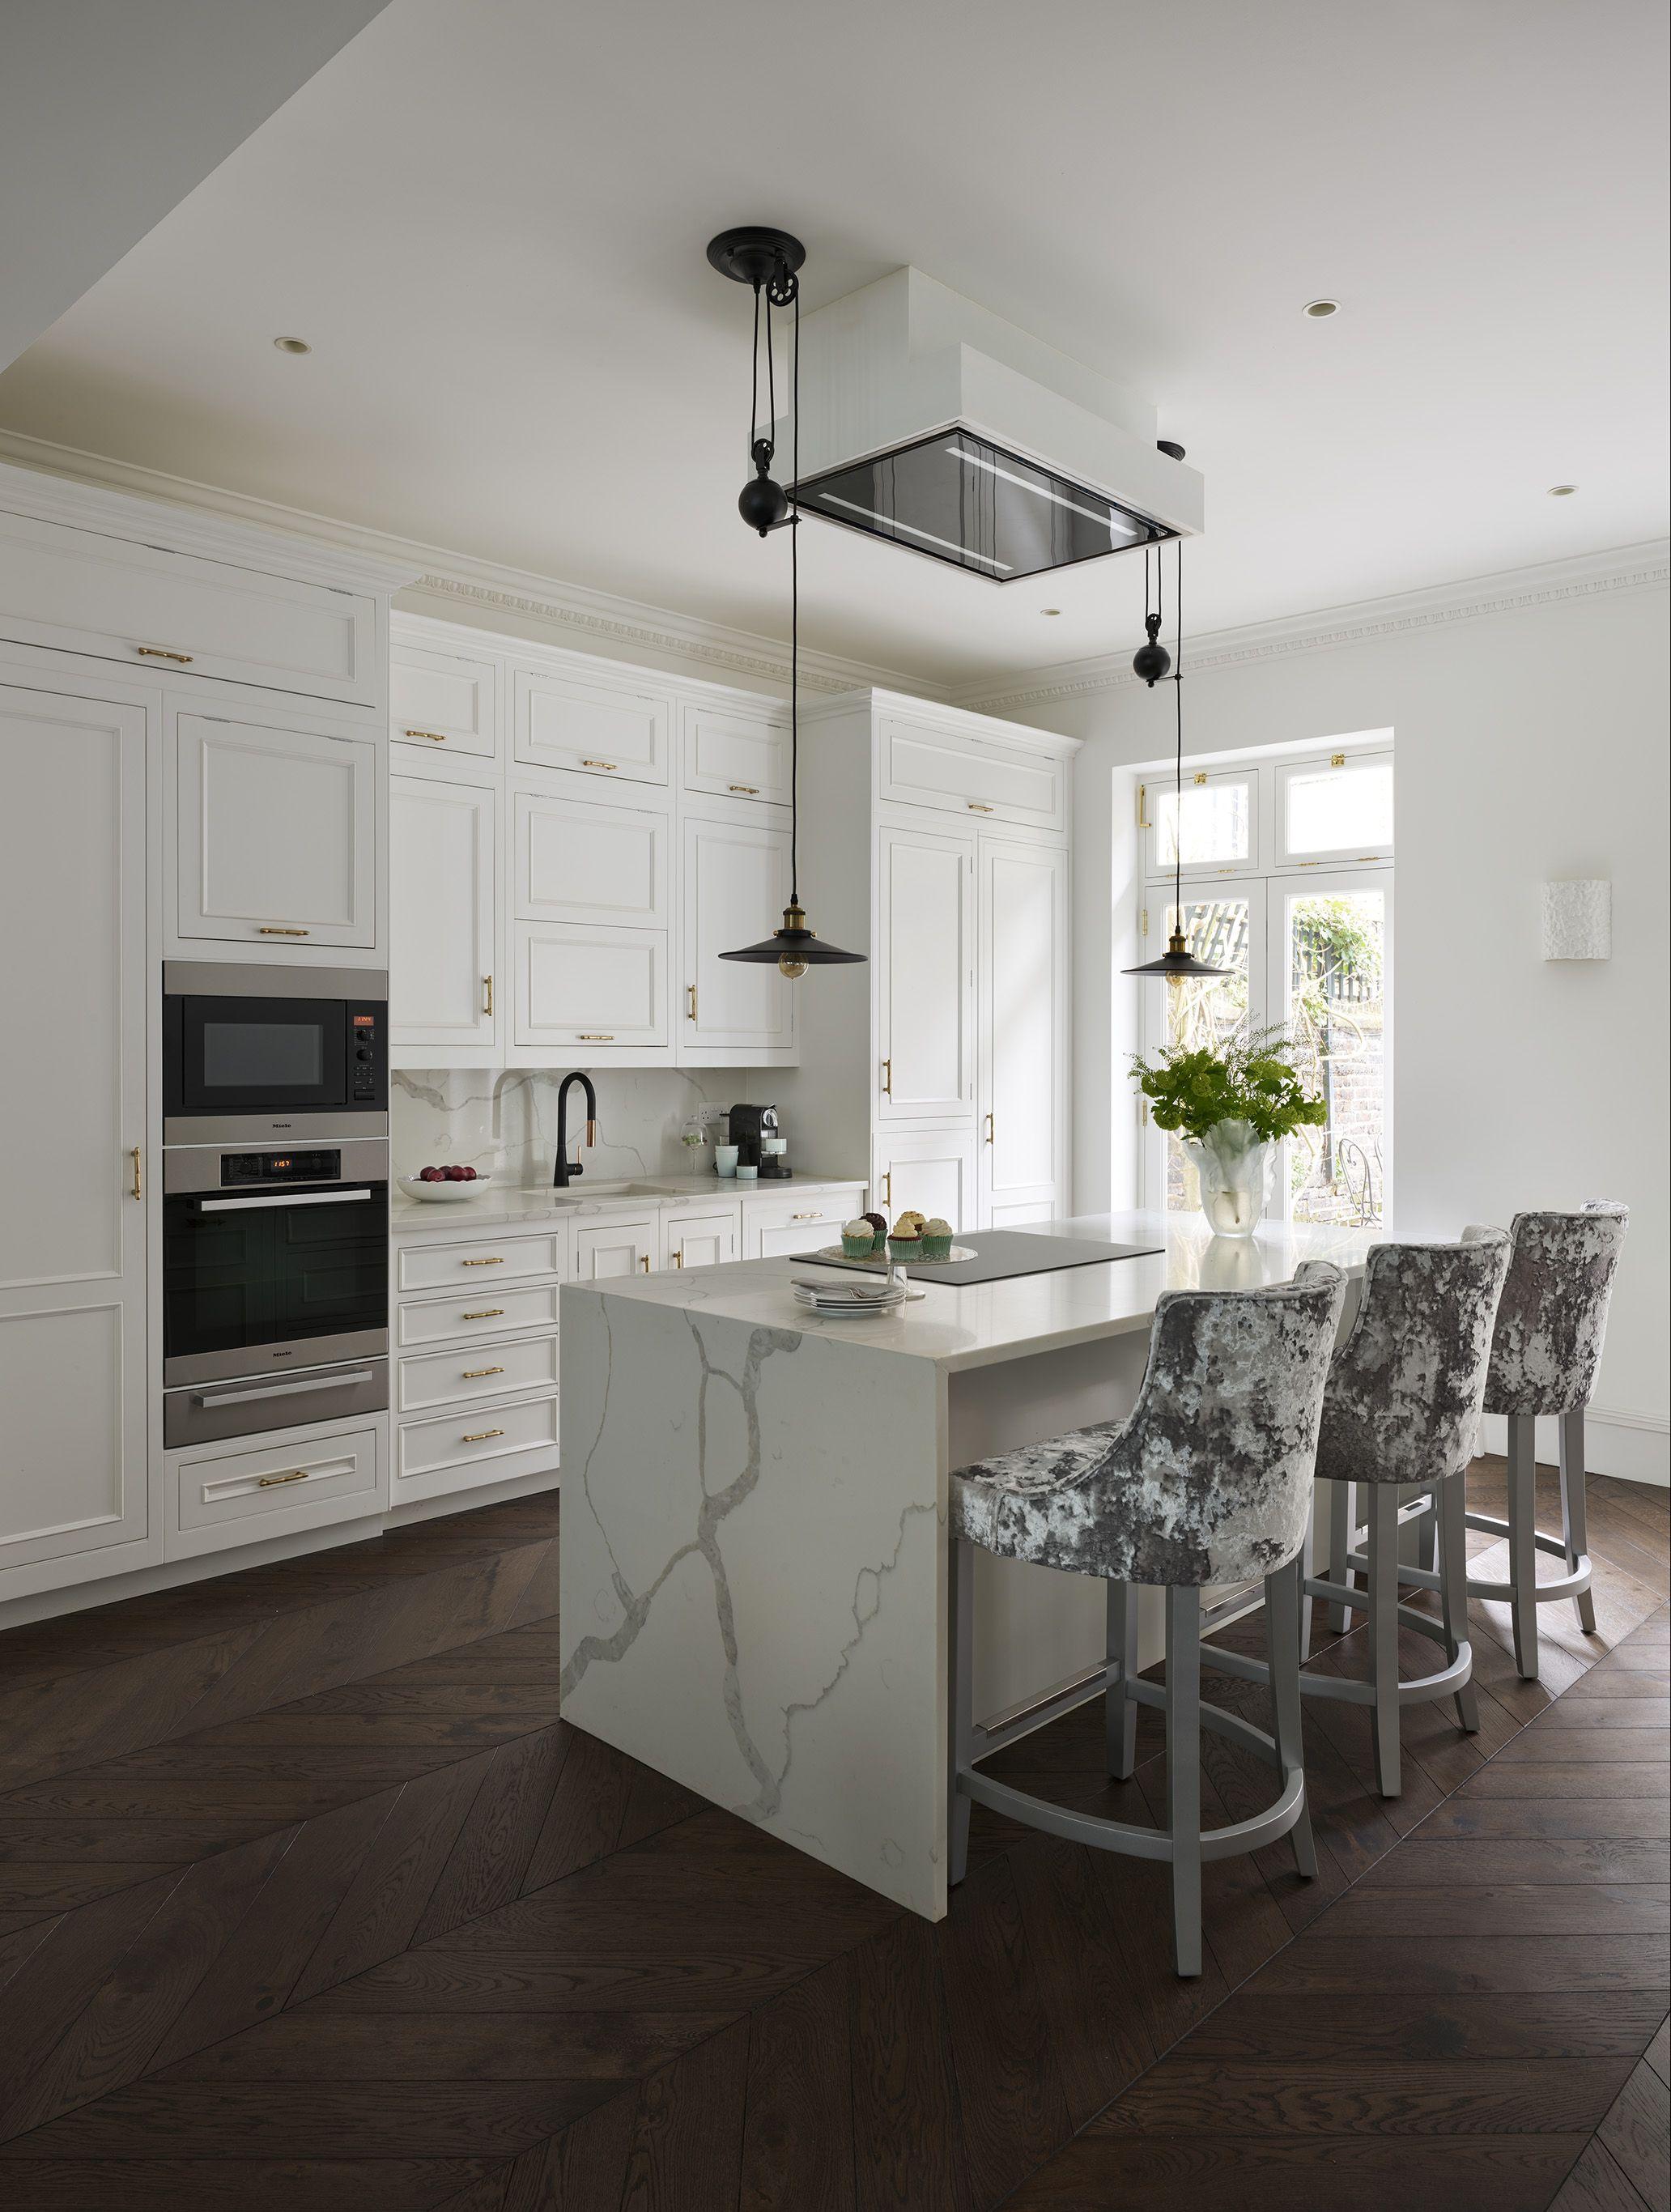 Kitchen Island Kitchen Design Ideas And Utilising Your Space For A Kitchen Island Modern White Kitchen Cabinets Bespoke Kitchen Design Kitchen Design